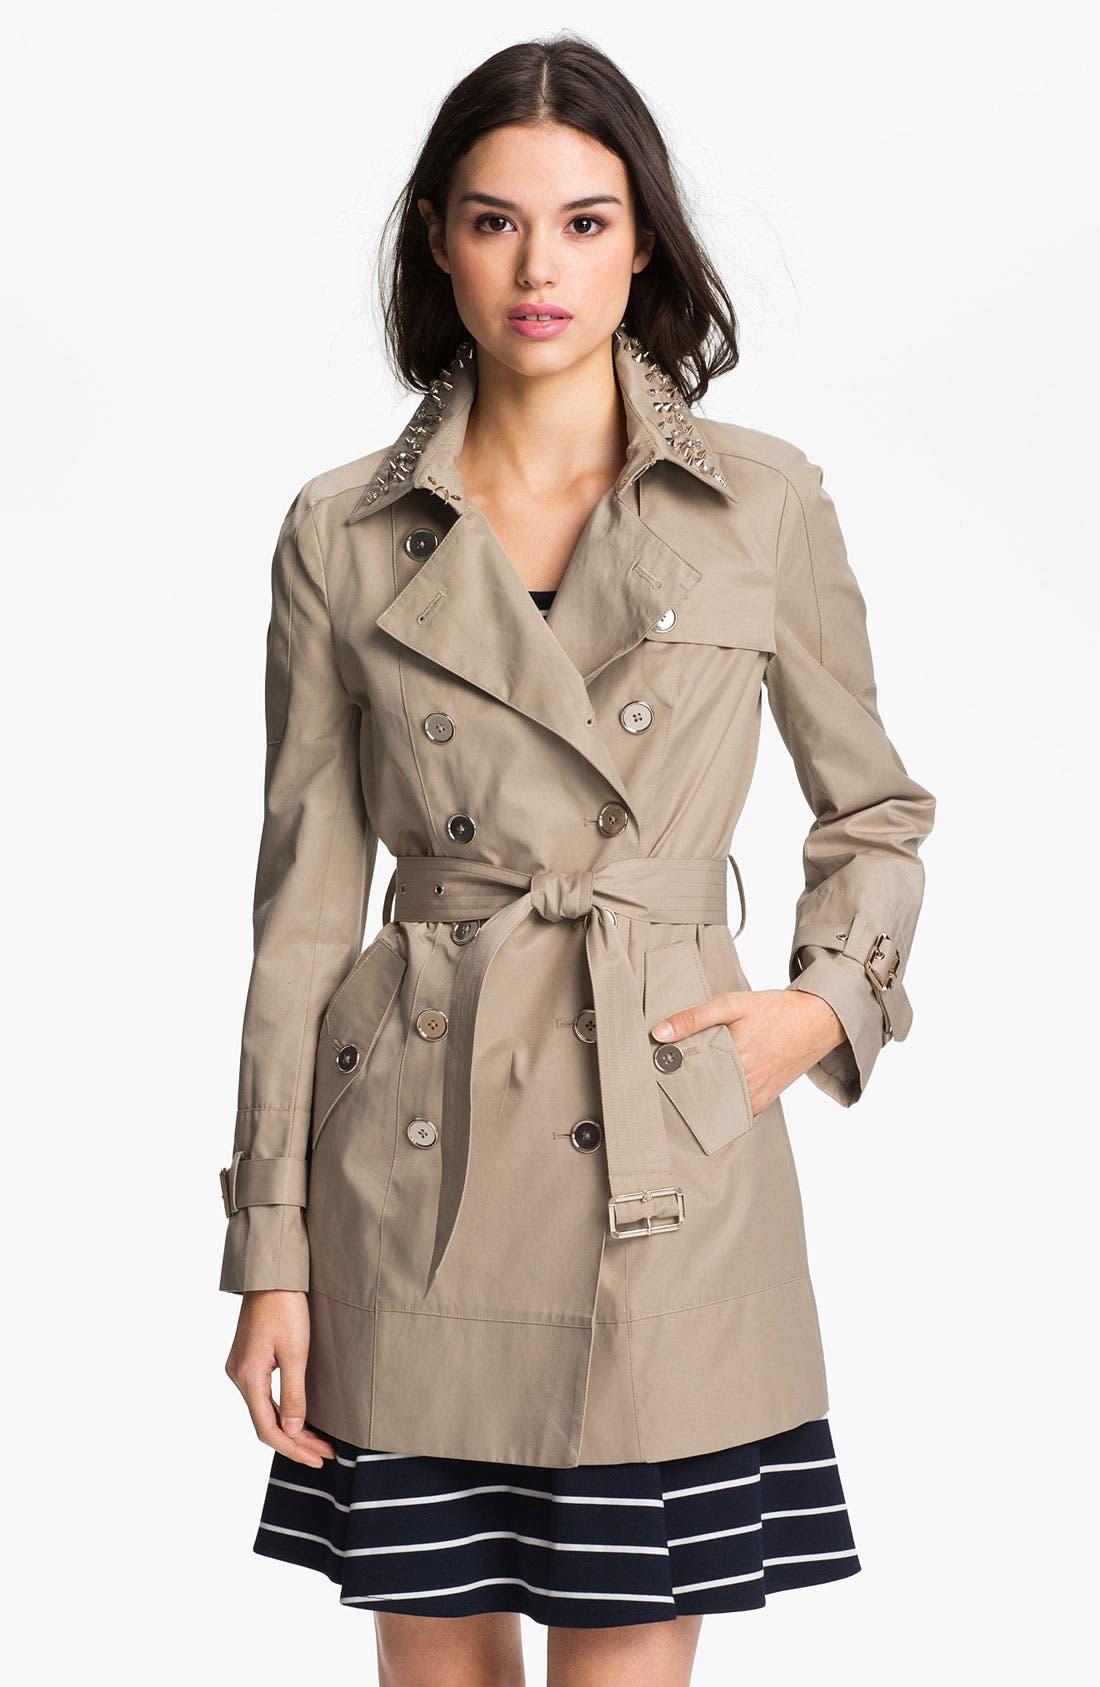 Alternate Image 1 Selected - Sam Edelman Embellished Collar Trench Coat